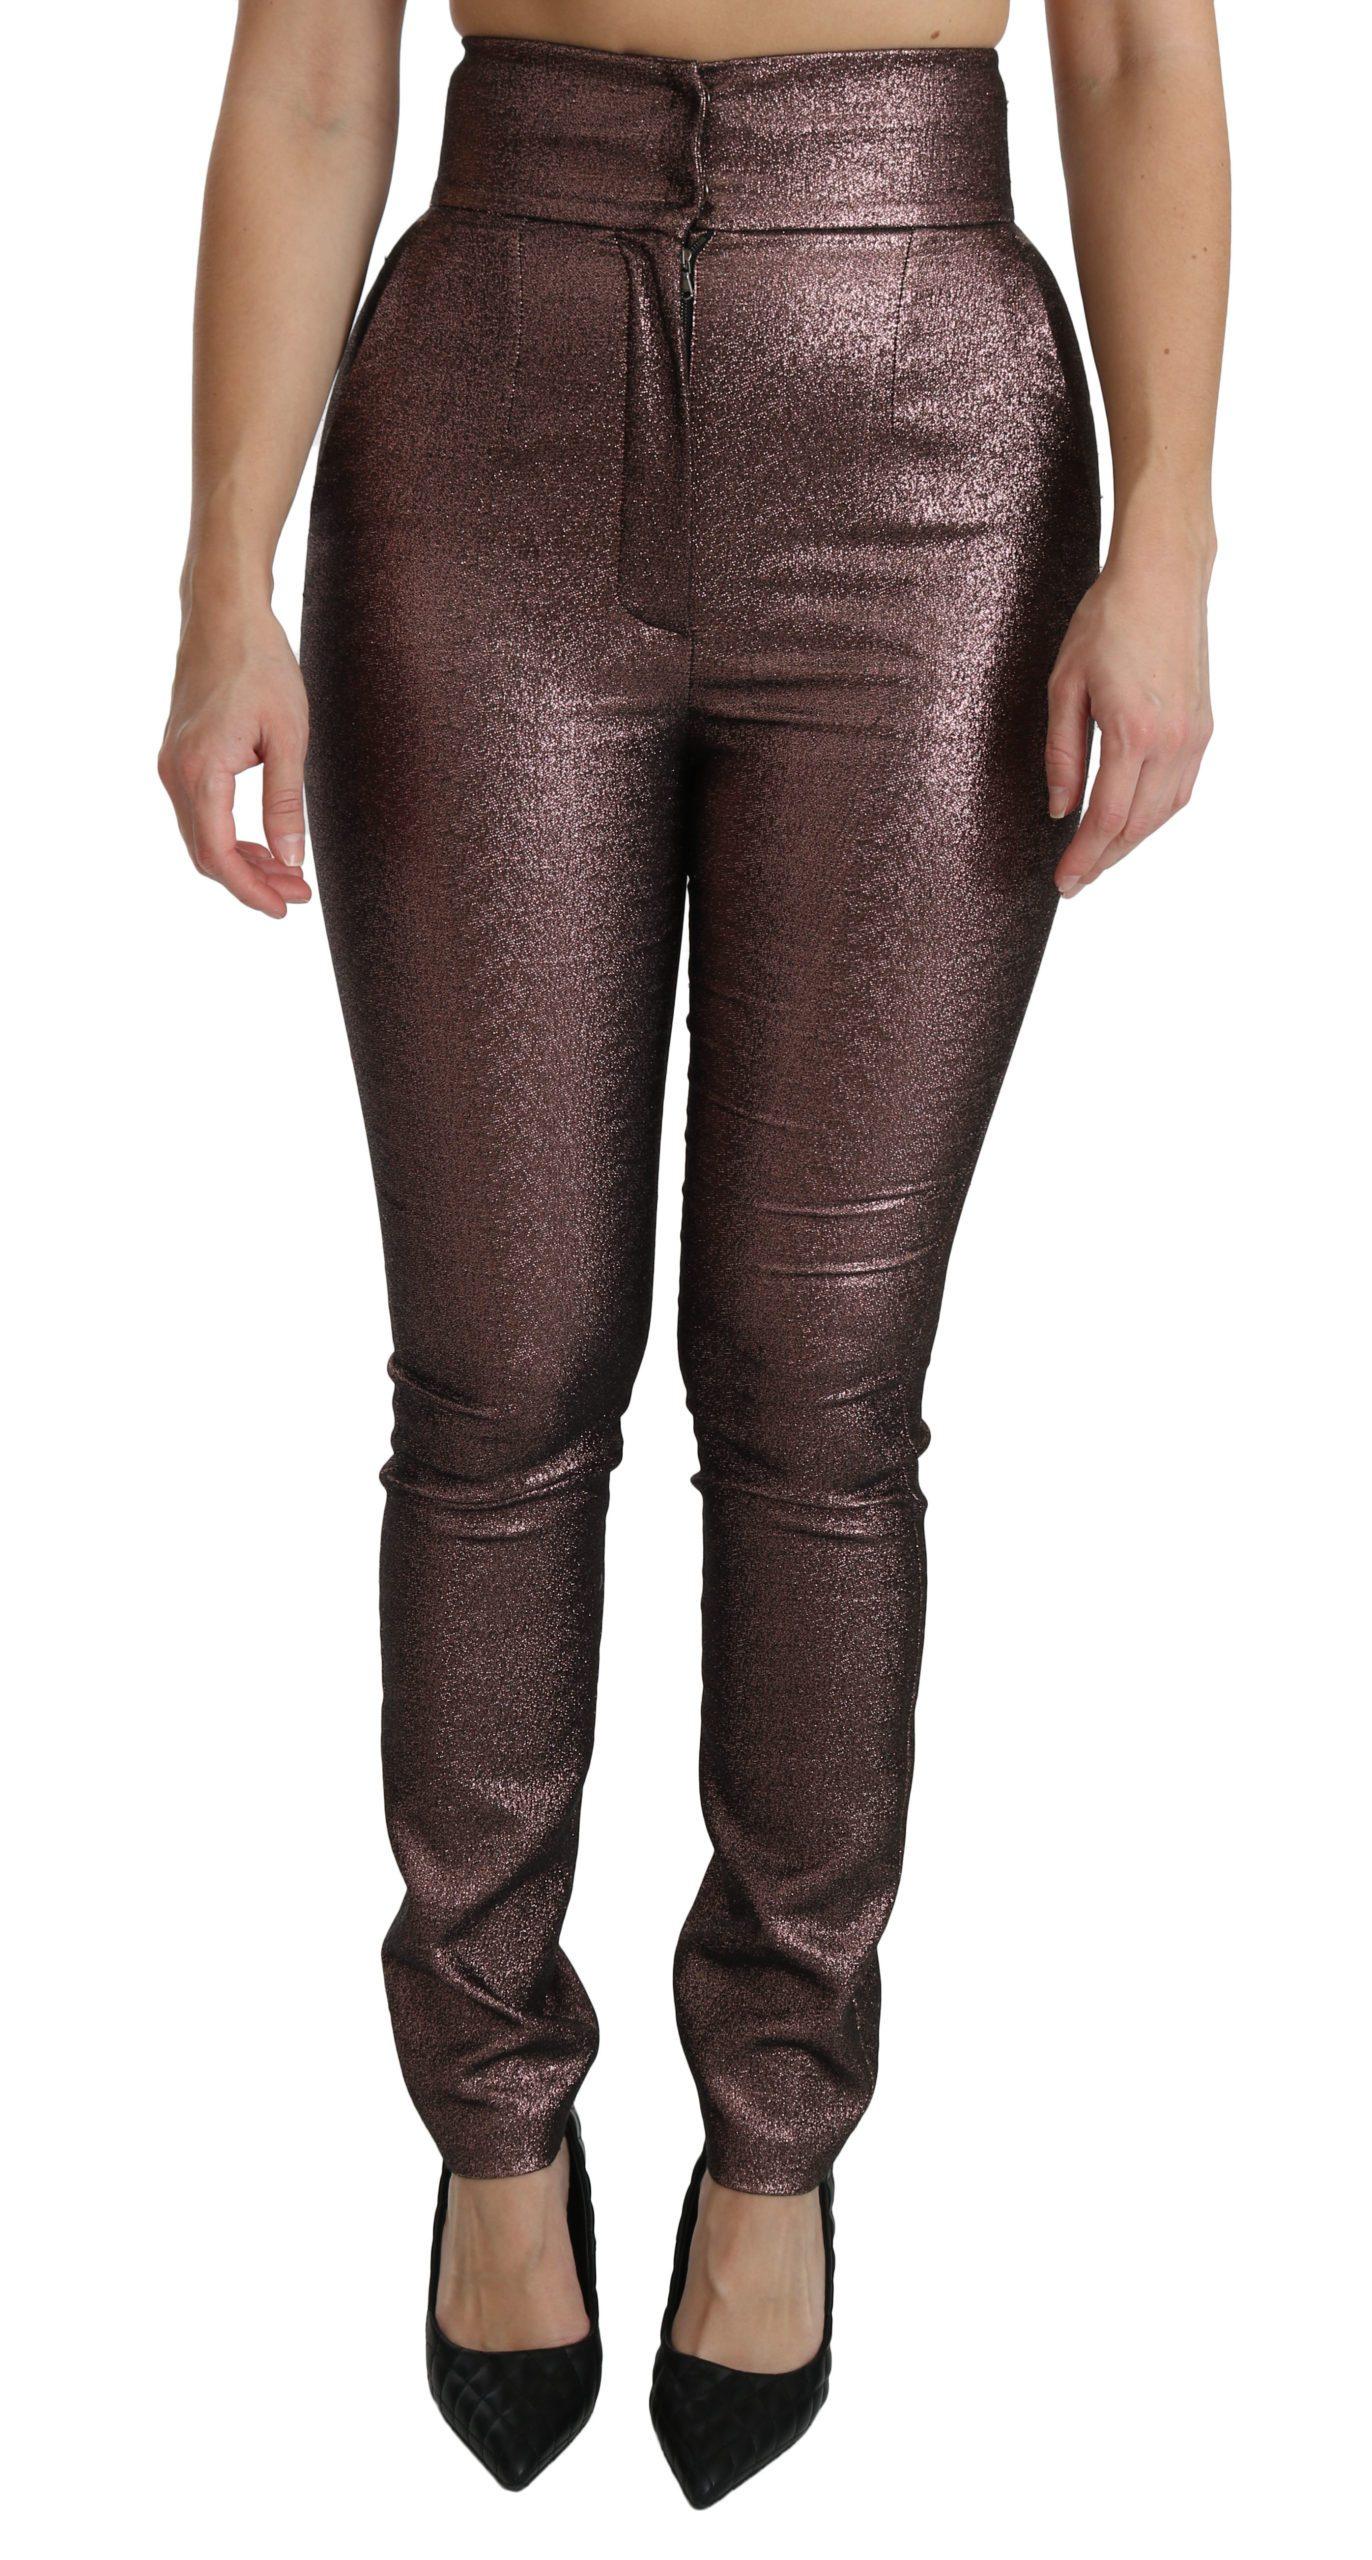 Dolce & Gabbana Women's Metallic High Waist Skinny Cotton Trouser Purple PAN70874 - IT40|S